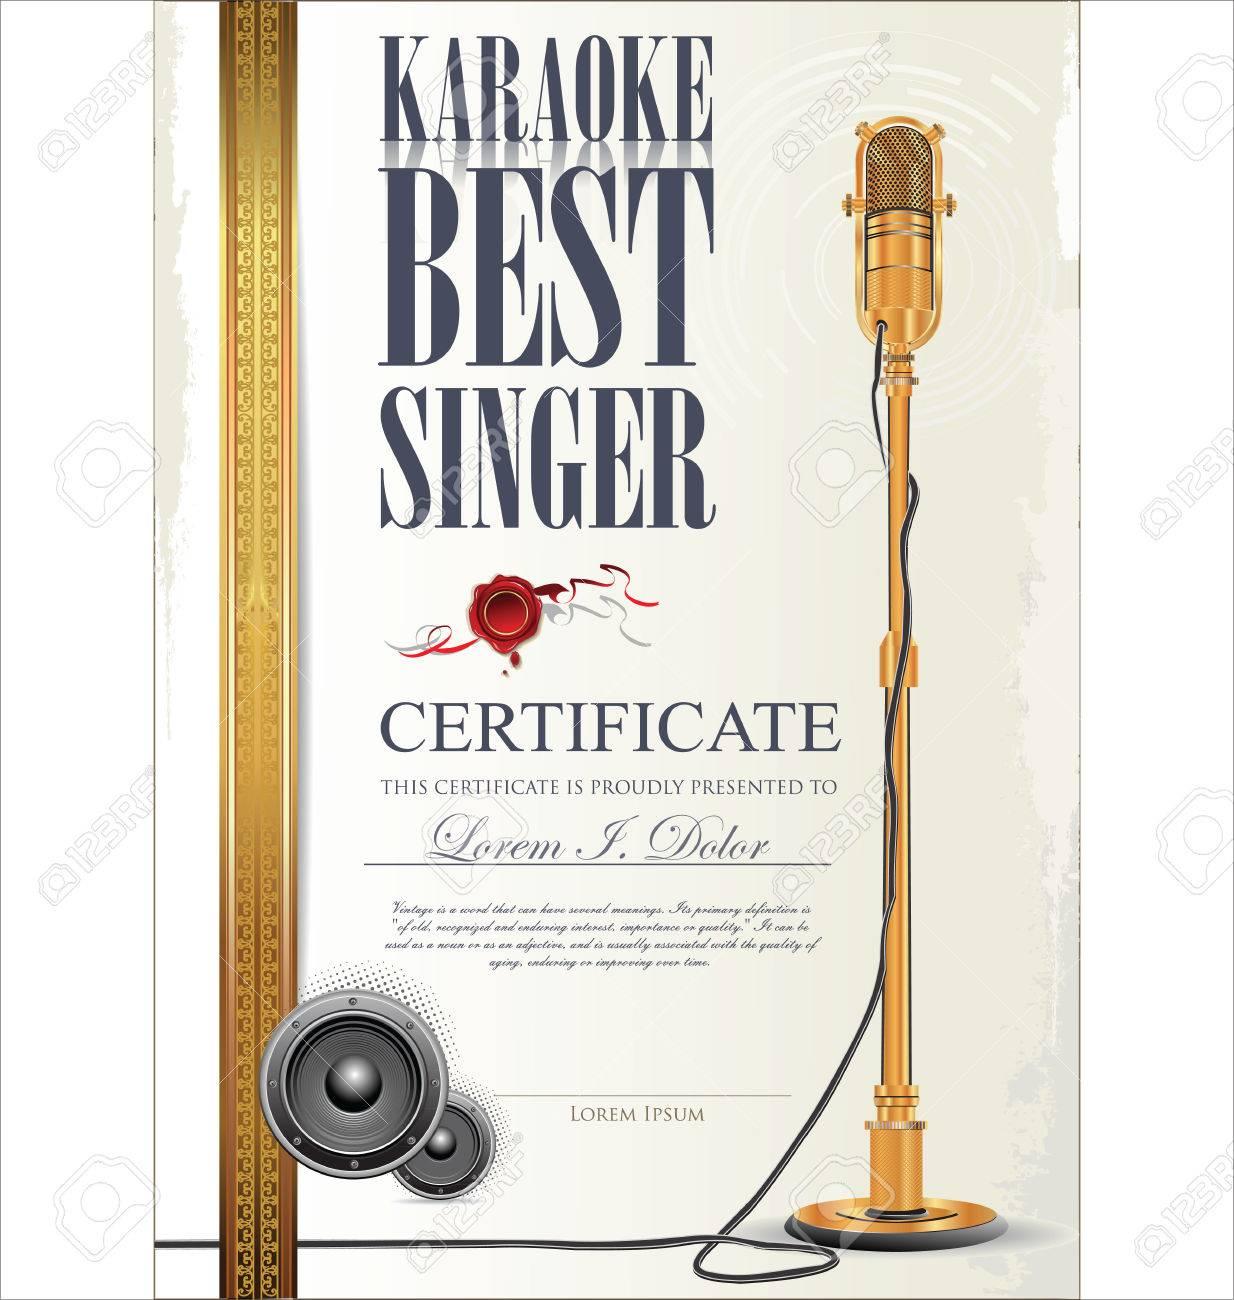 Karaoke certificate template best singer royalty free cliparts karaoke certificate template best singer stock vector 23320109 yadclub Image collections